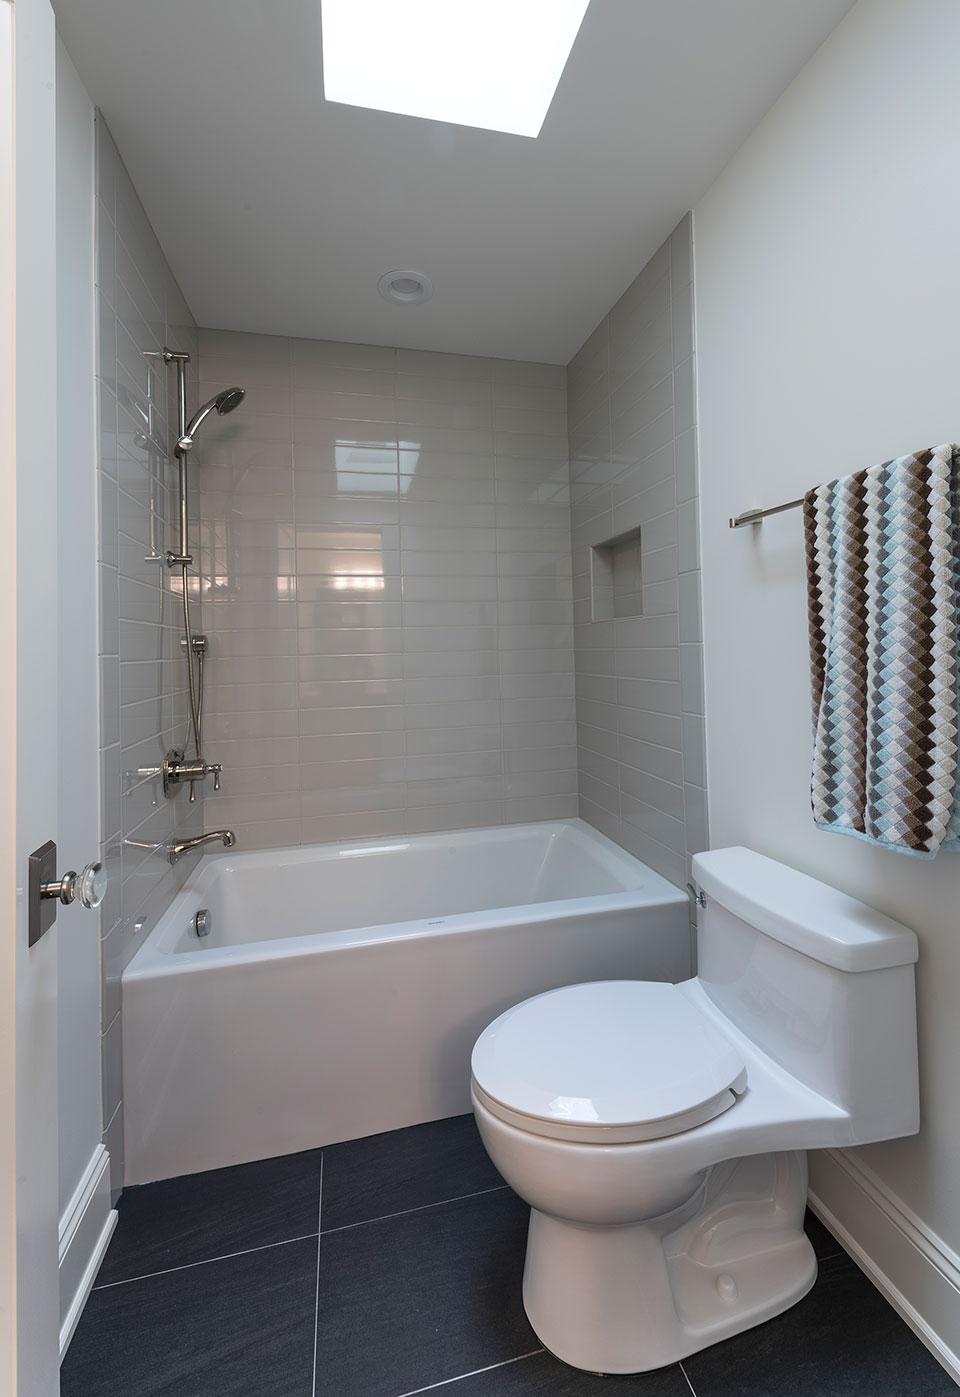 1943-Glen-Oak-Glenview - Jack and Jill Bathroom - Globex Developments Custom Homes